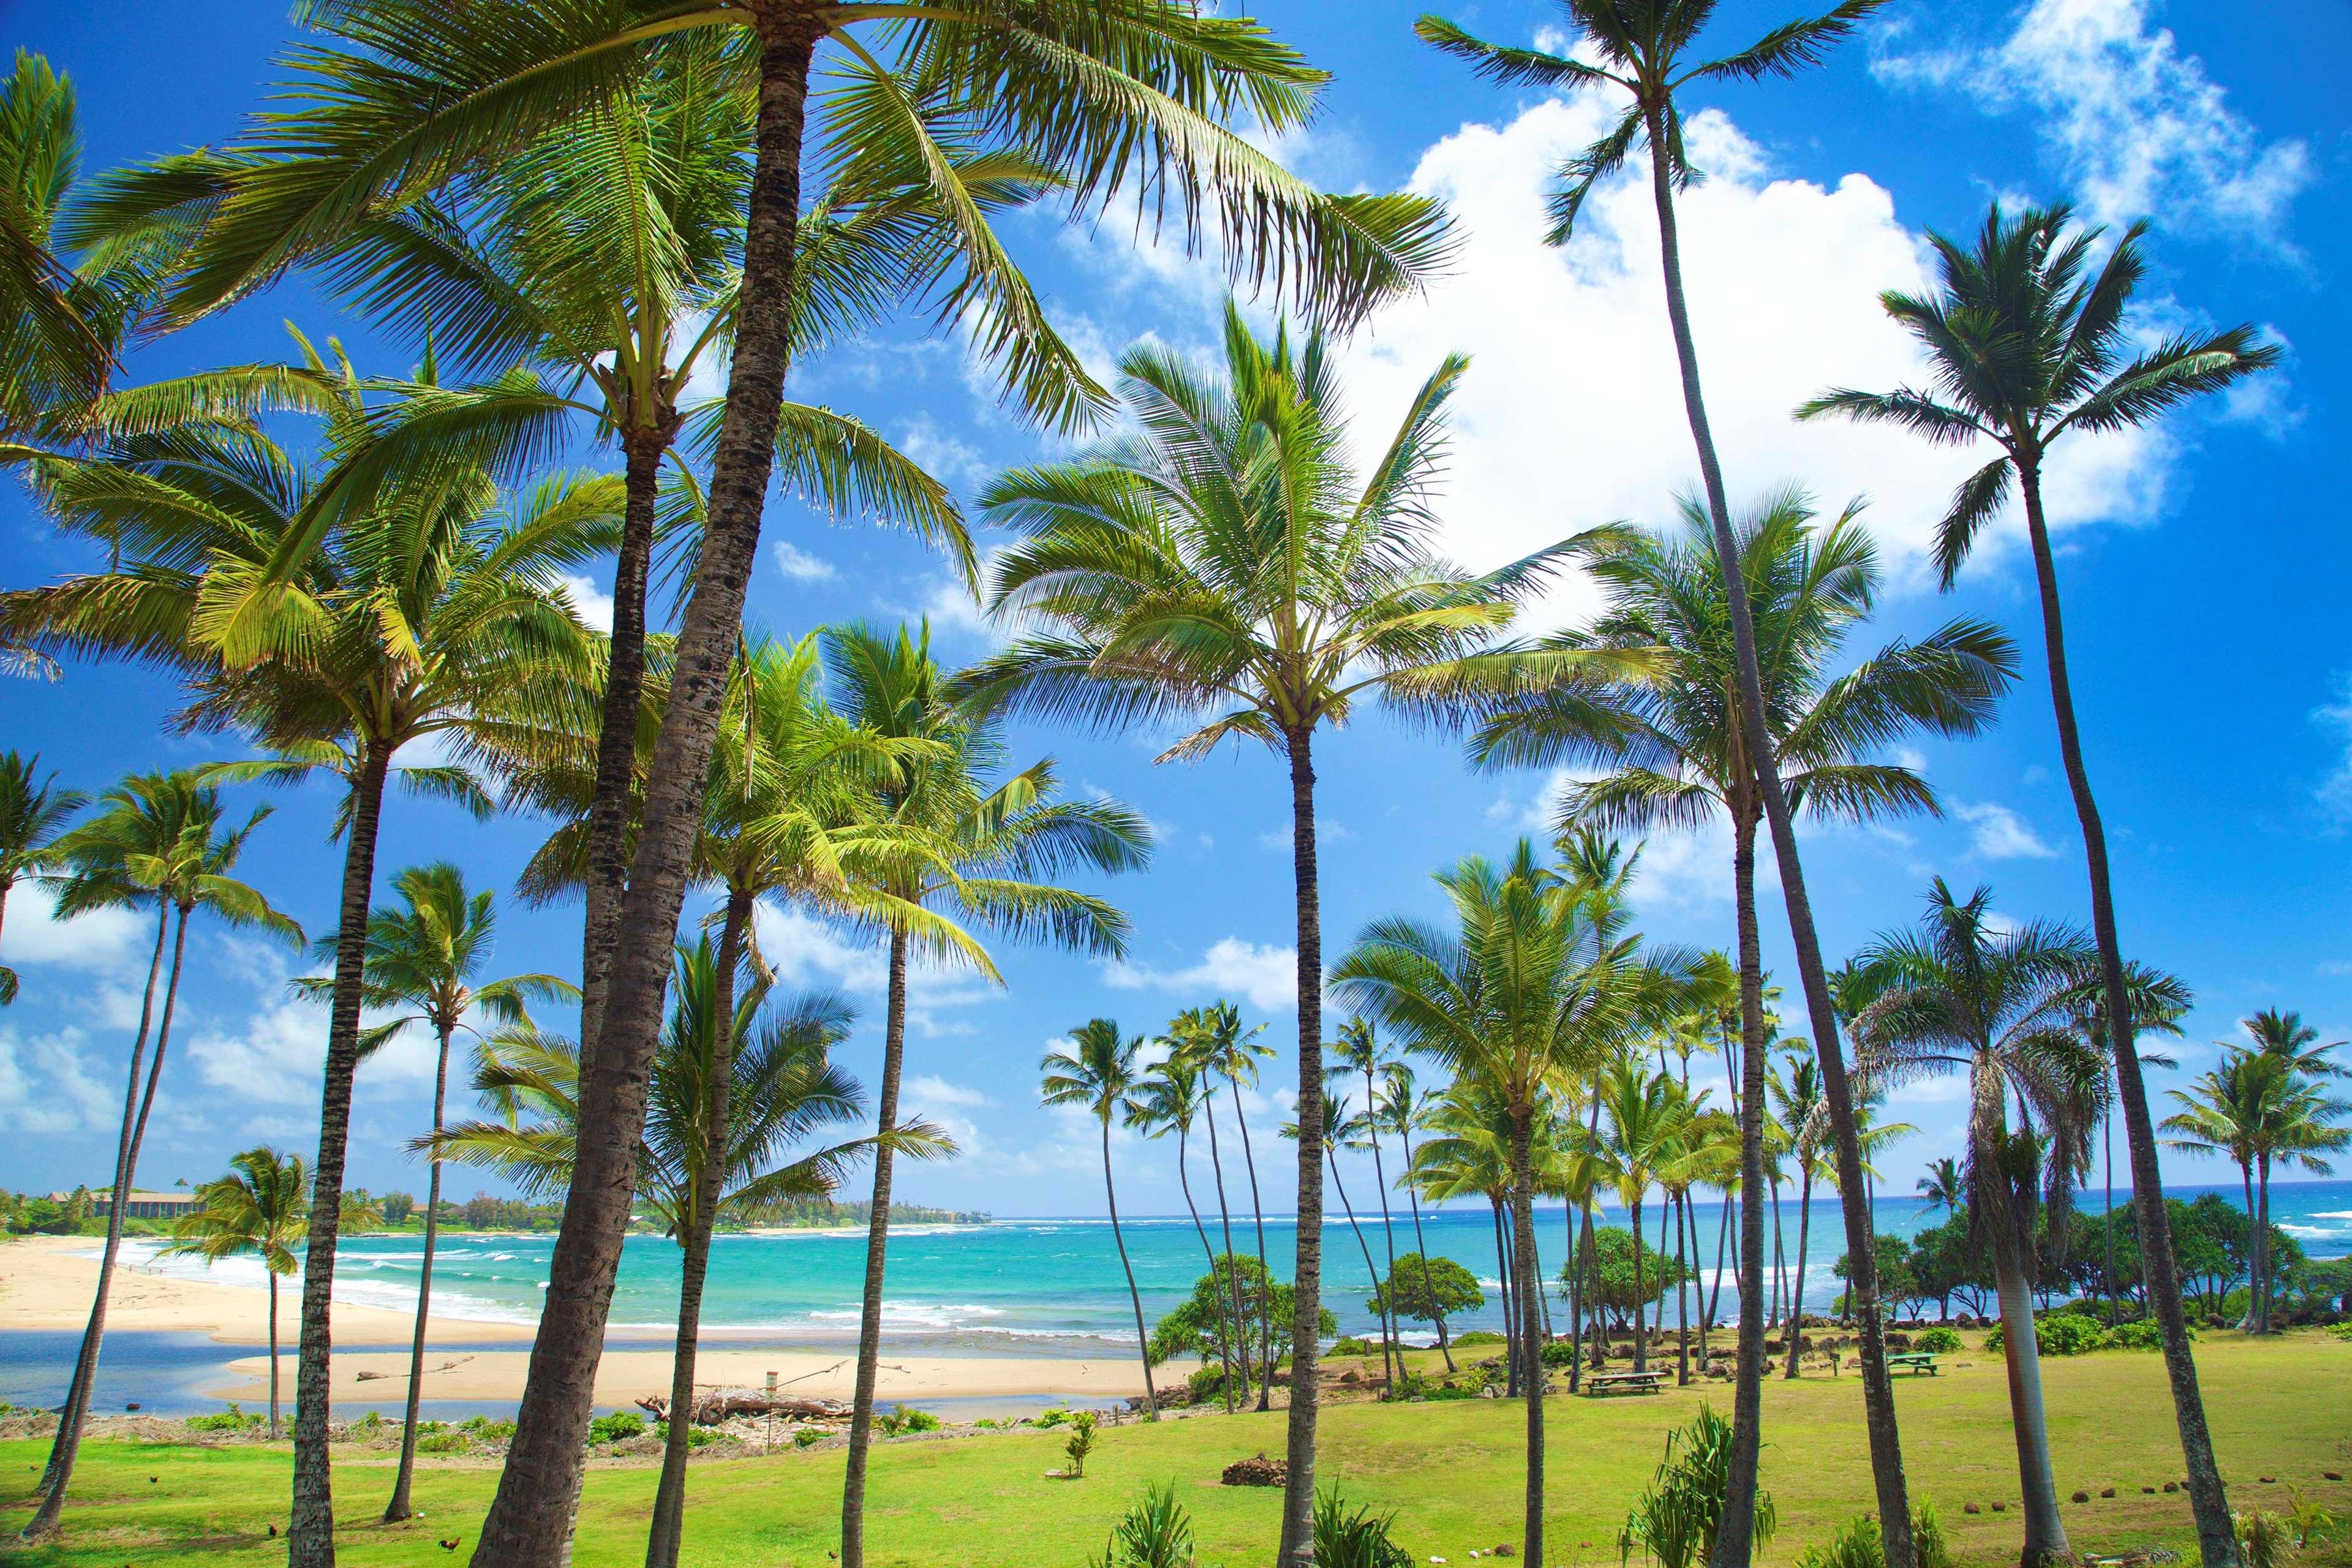 Hilton Garden Inn Kauai Wailua Bay Kapaa HI | Bed And Breakfasts